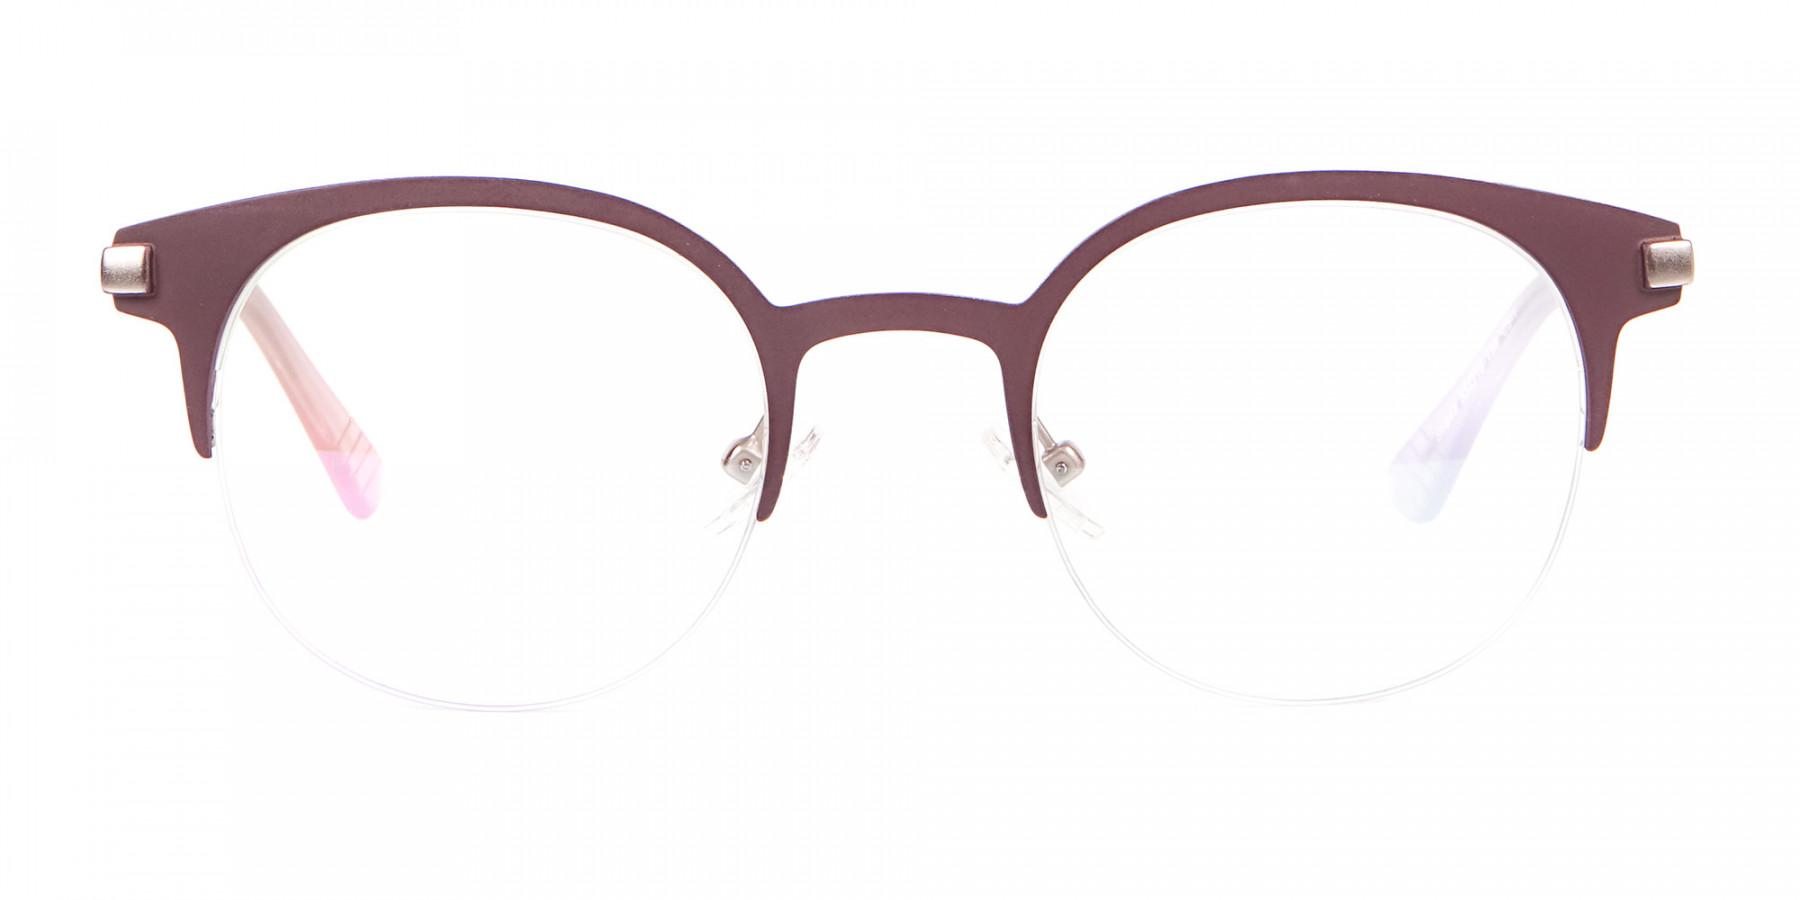 Woman 50's Retro Round Half-Rims Glasses UK-1